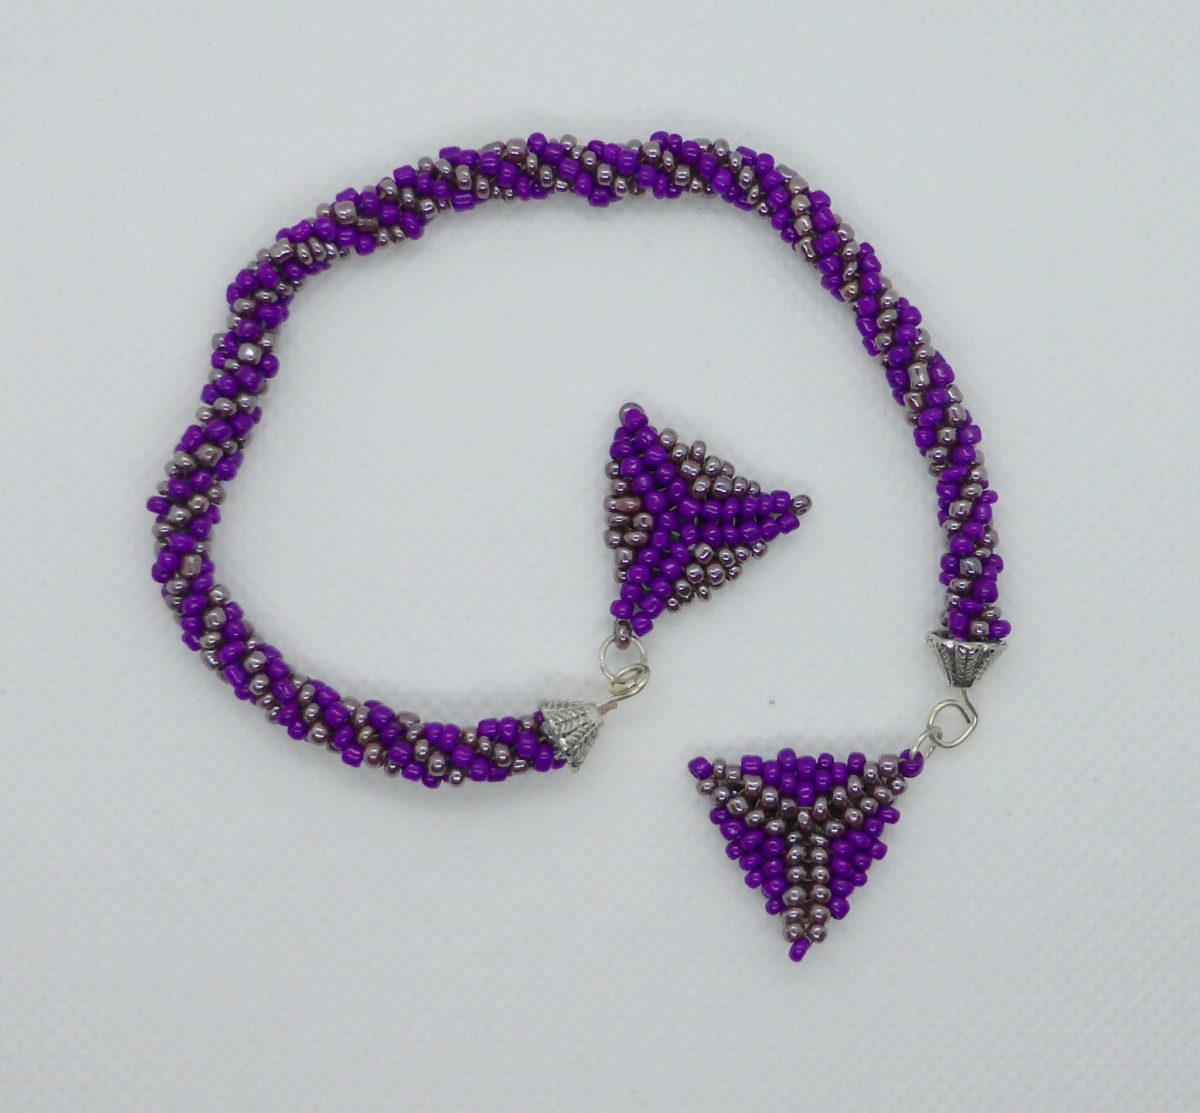 Ljubičasta ogrlica donji deo